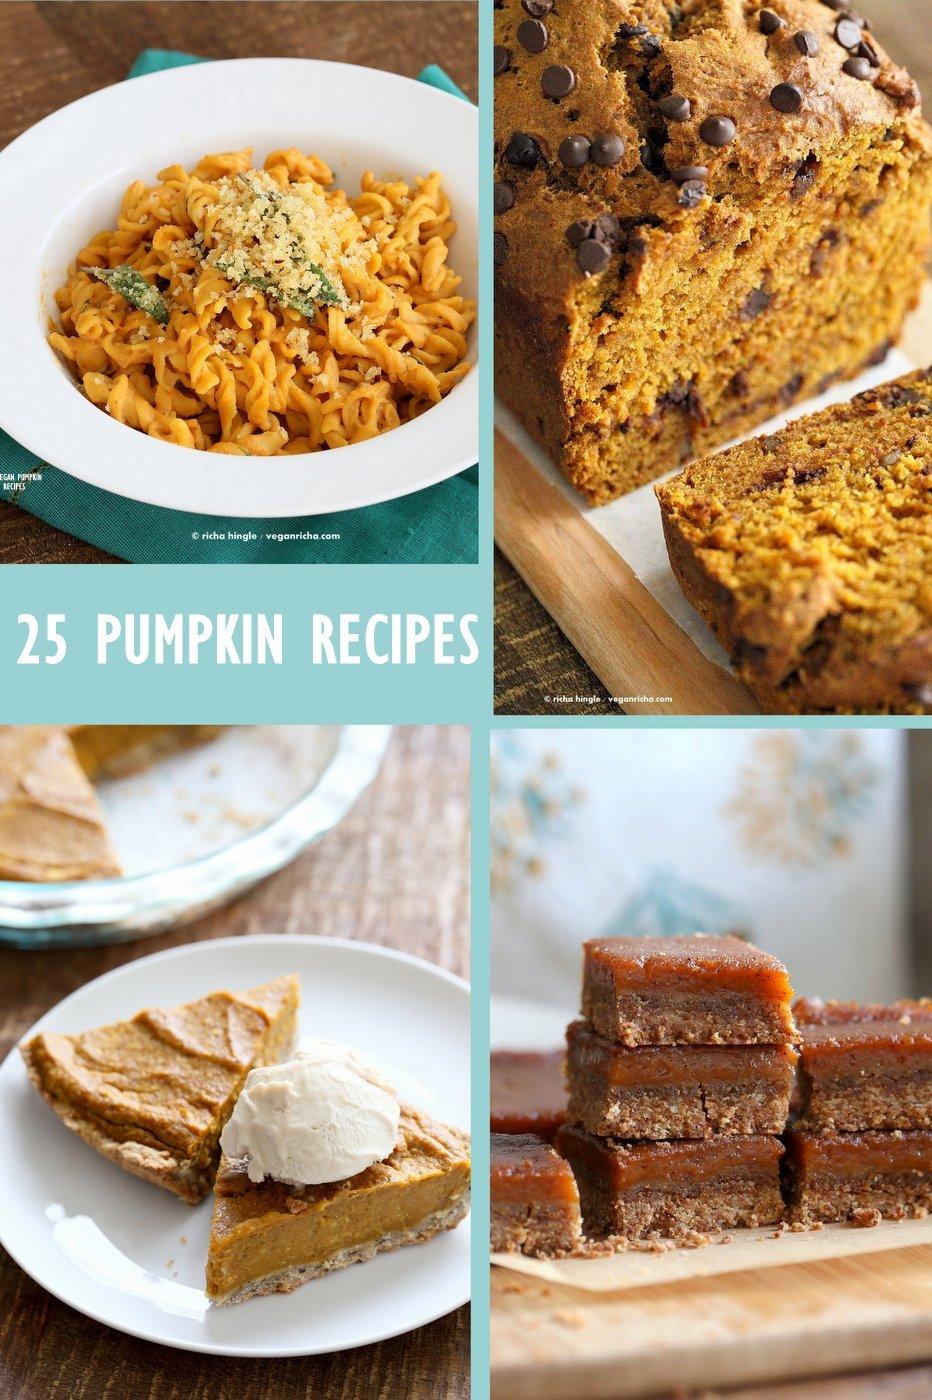 25 Vegan Pumpkin Recipes to Make this Fall. Pumpkin Crumb Cake, Bread, Muffins, Salad, Chili, Pasta, Pumpkin Cinnamon Rolls and More.  VeganRicha.com